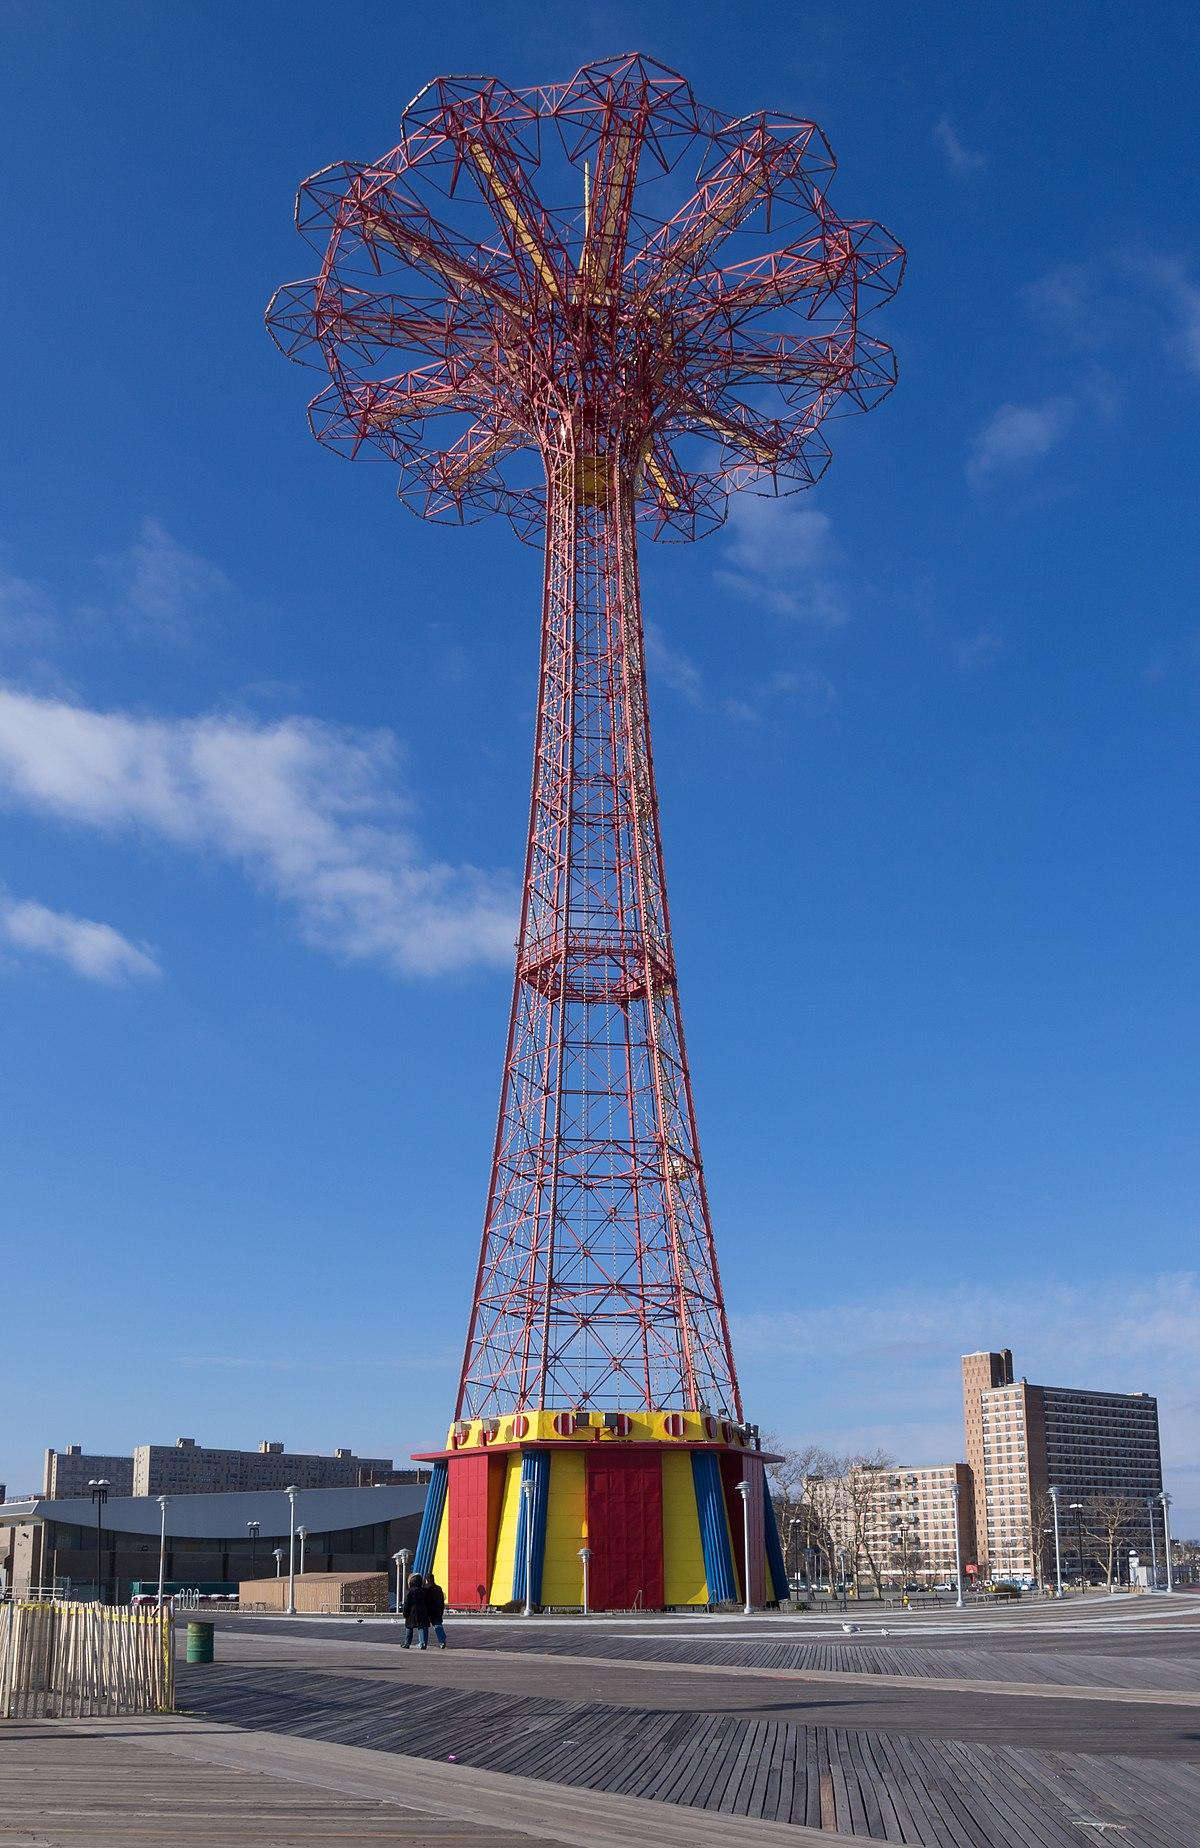 National Coney Island Chili Gluten Free